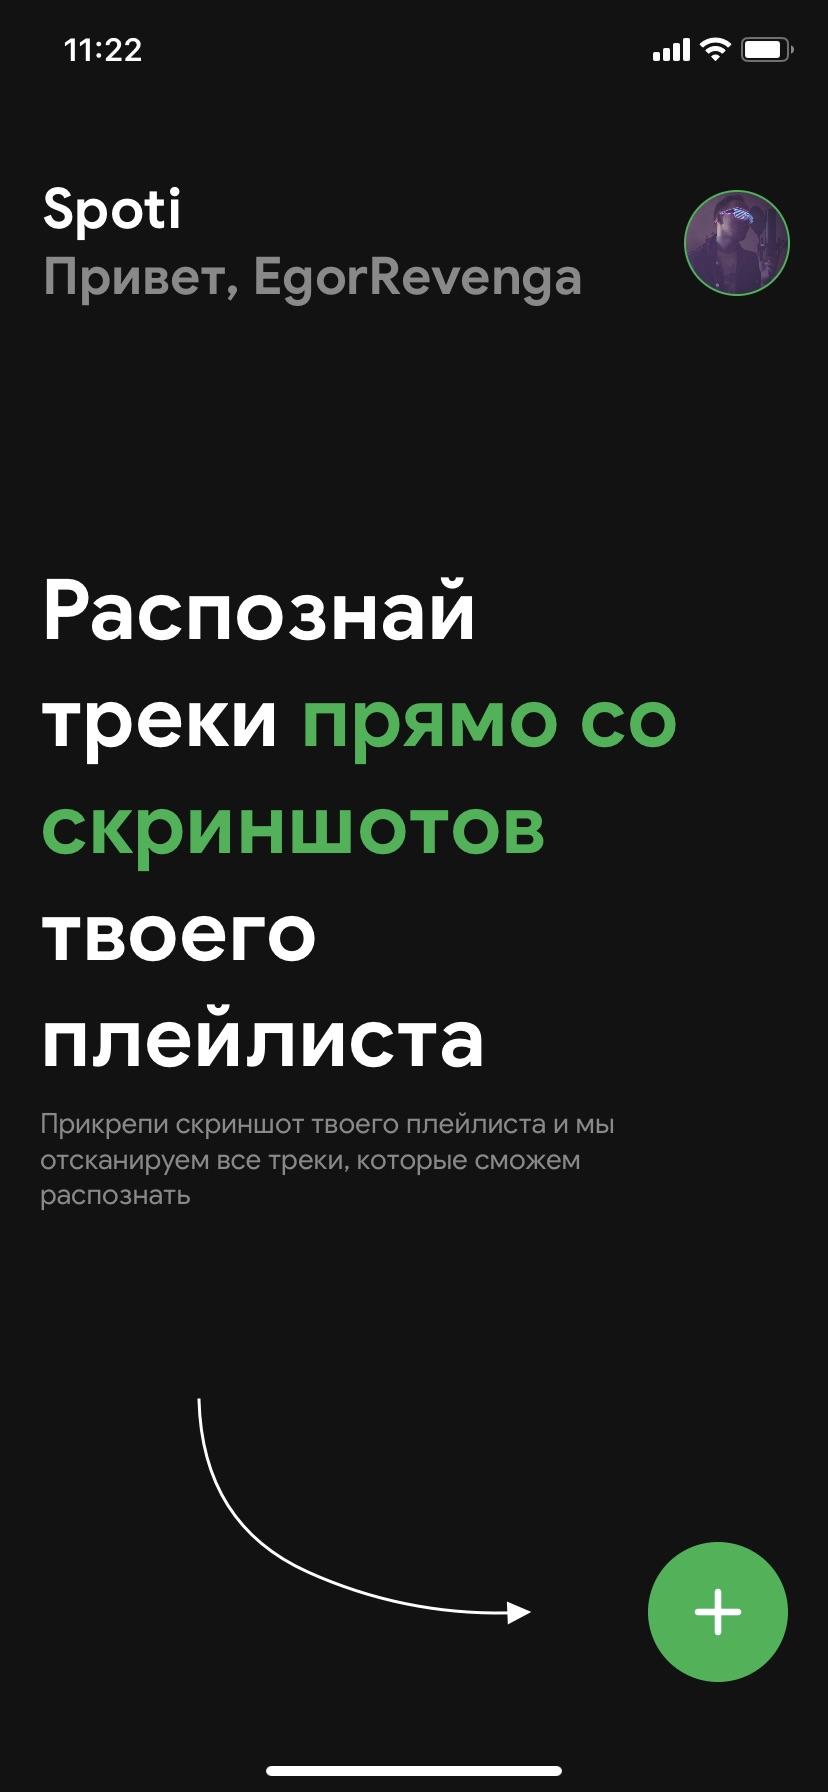 Перенос плейлистов через SpotiApp